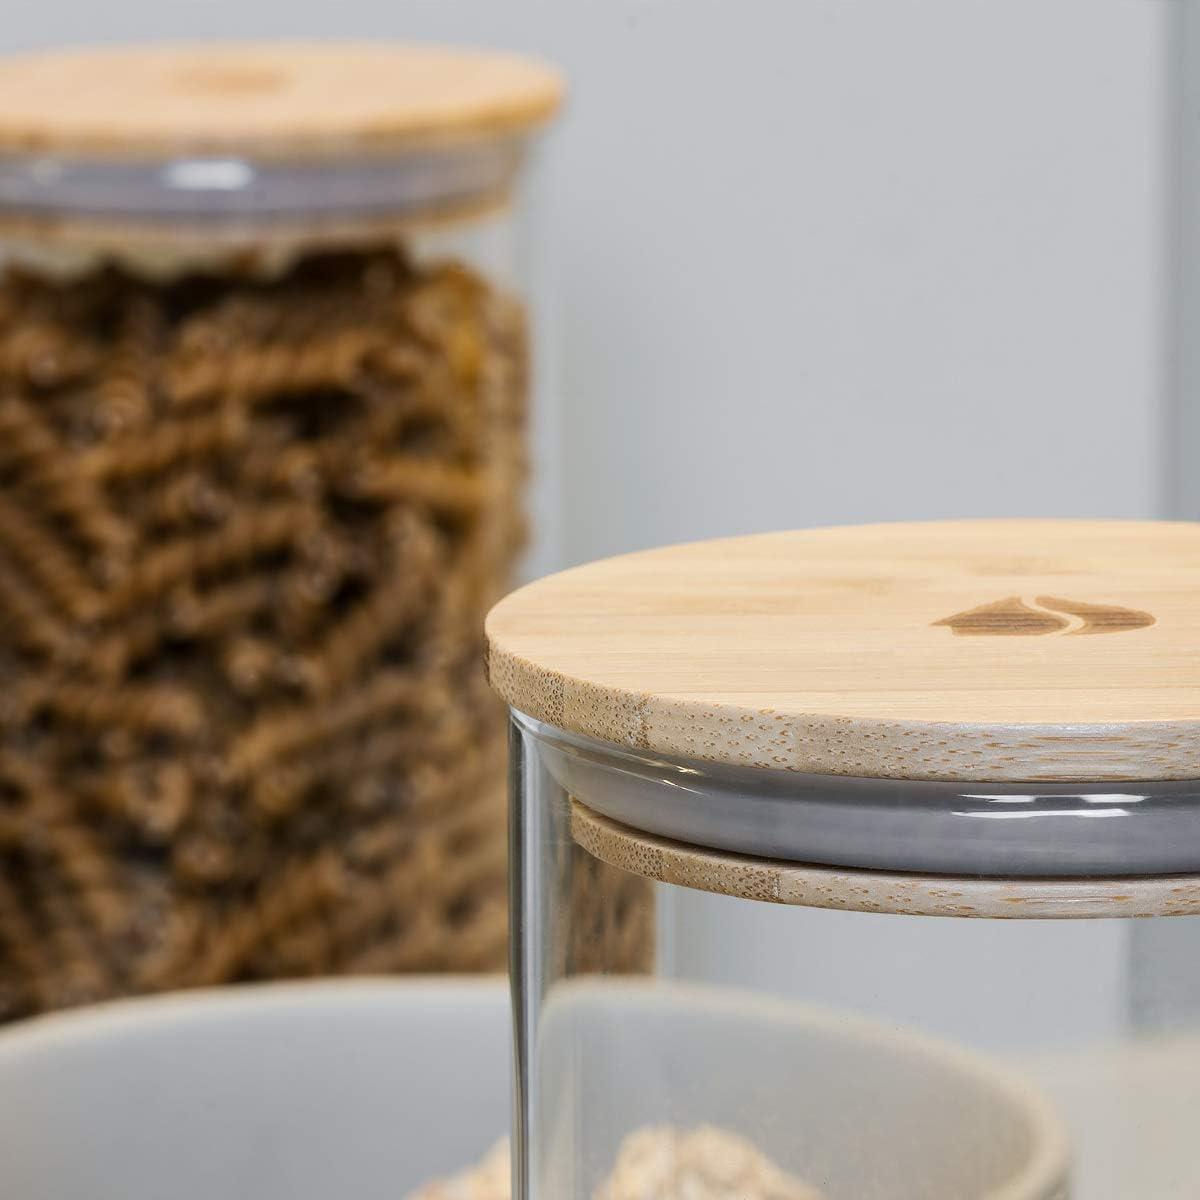 1L Navaris Set de 3 Botes de Cristal con Tapa de bamb/ú frascos para la Cocina Tarros para Alimentos como caf/é Pasta arroz harina Cereales